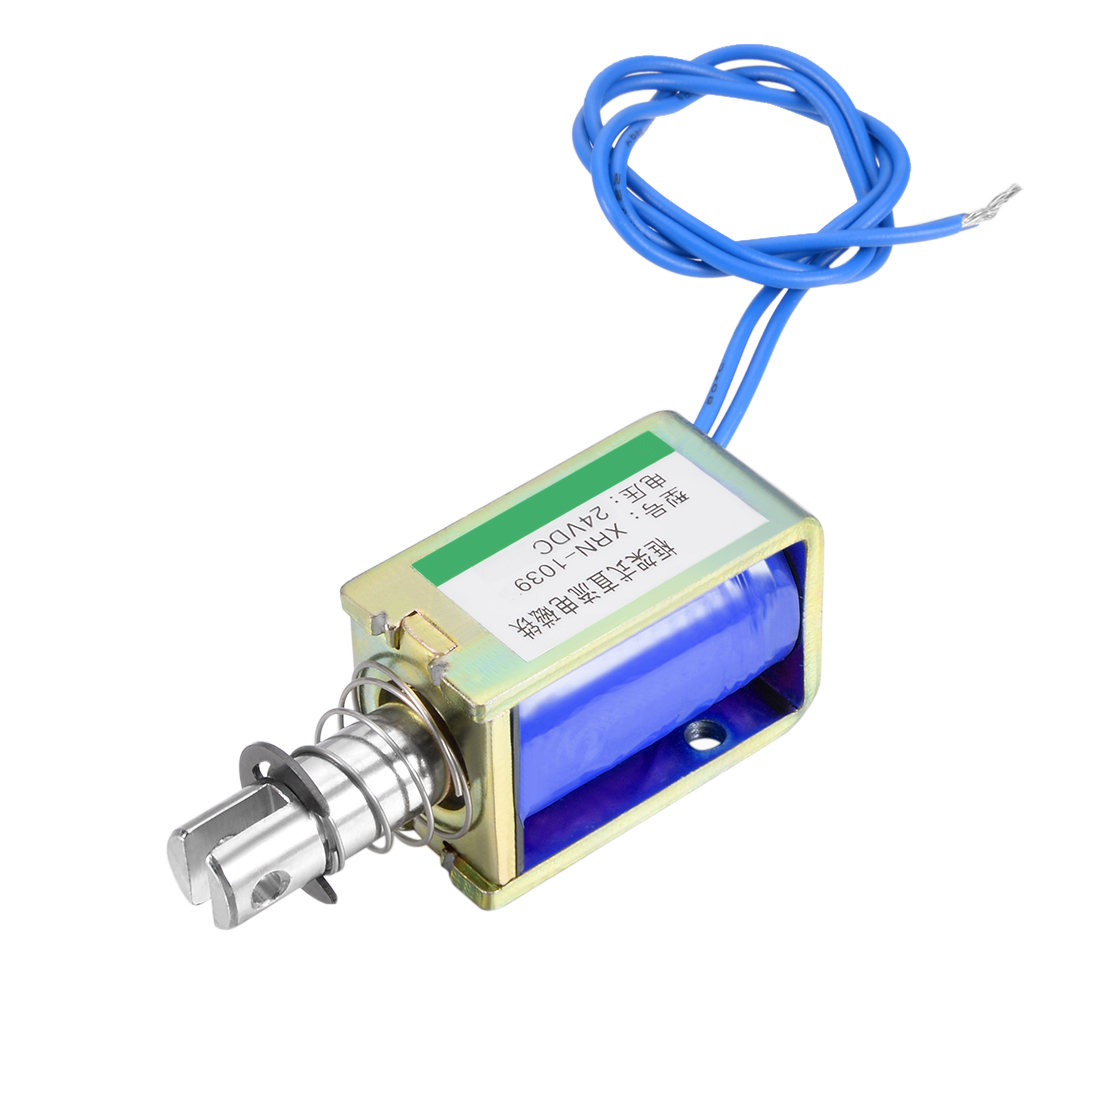 XRN-1039 DC 24V 0.8A 25N 19.2W 10mm Pull Type Open Frame Solenoid Electromagnet